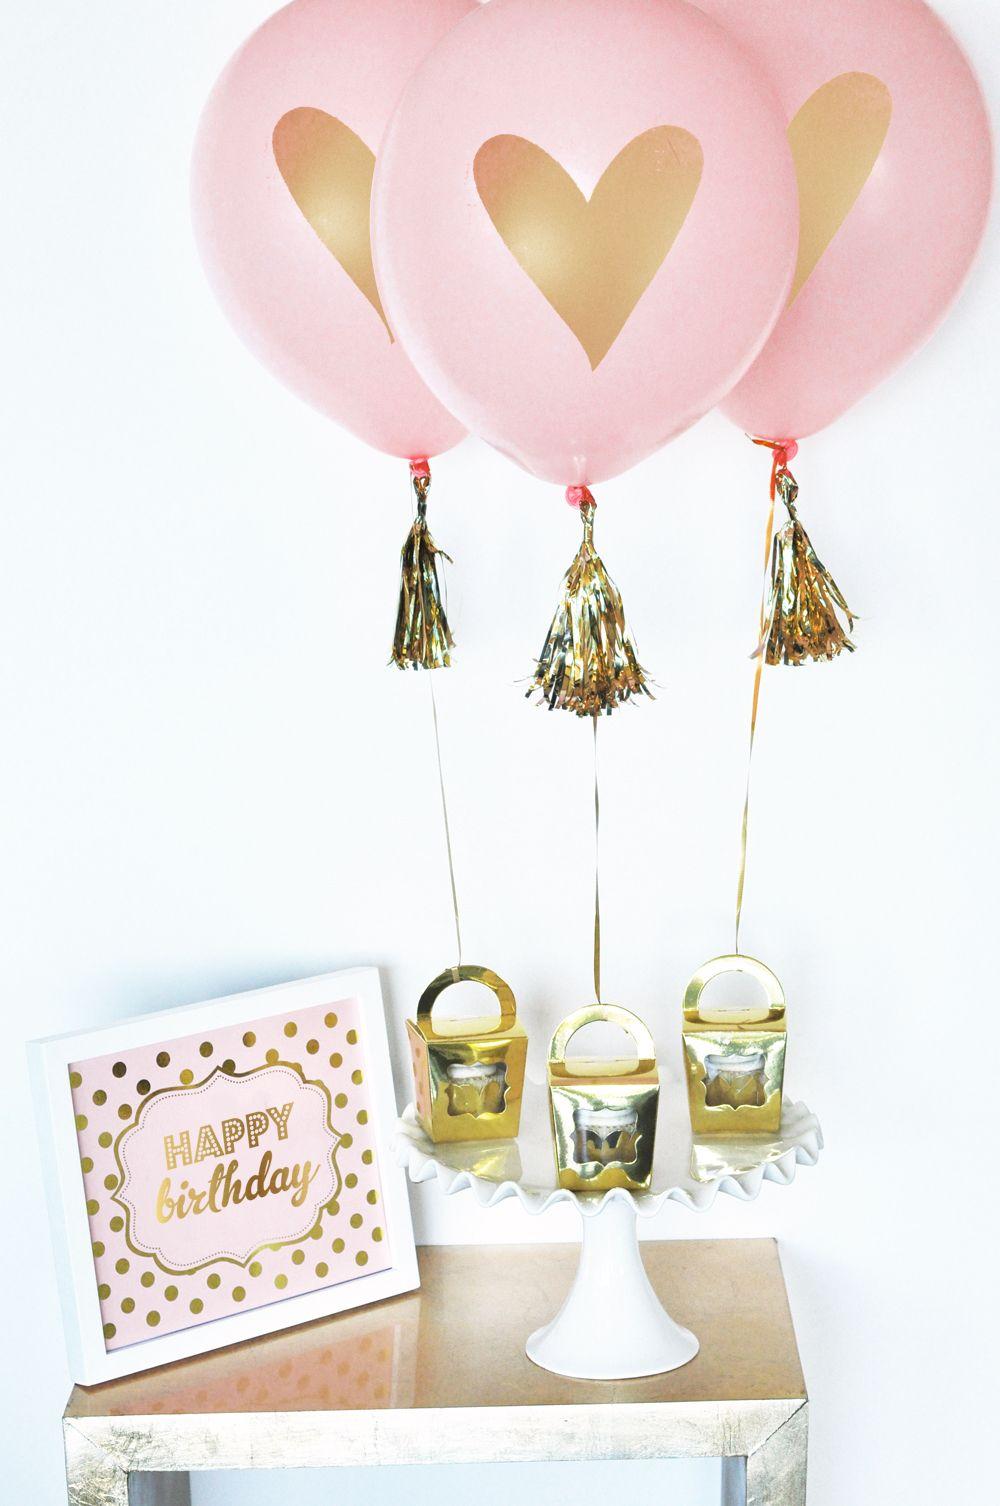 Happy Birthday Party Balloons Set Of 3